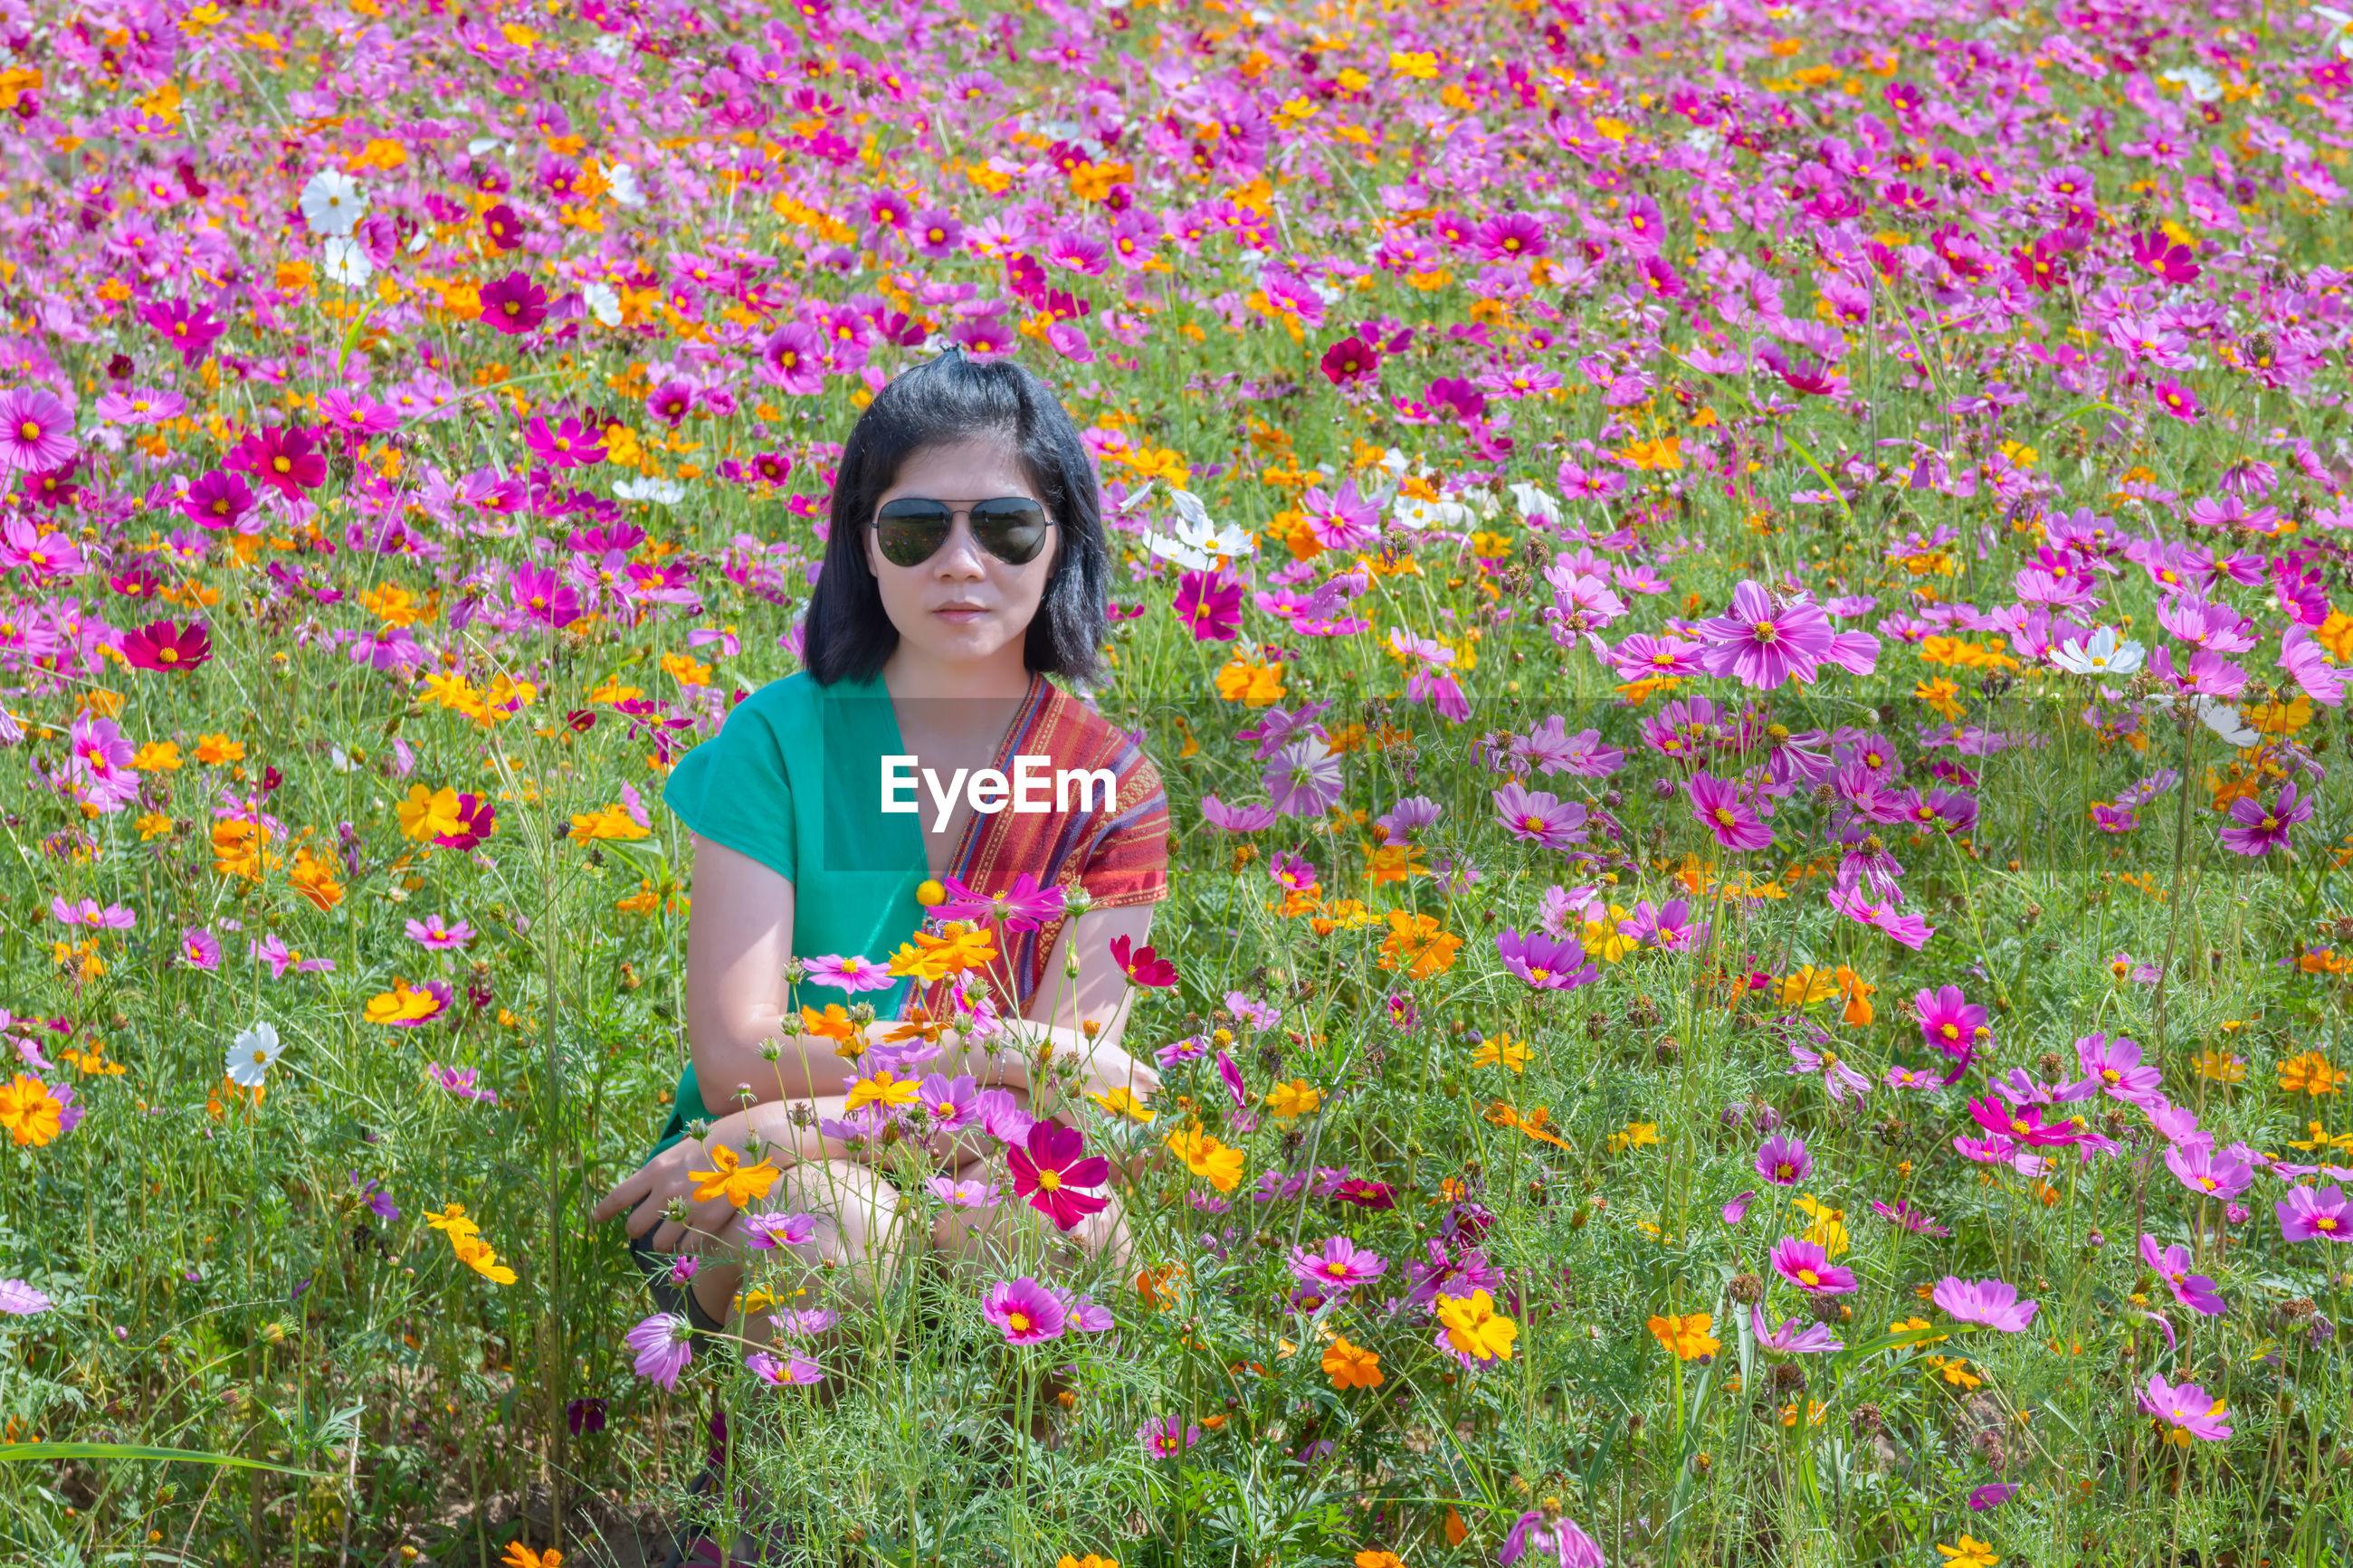 Woman amidst flowers on field